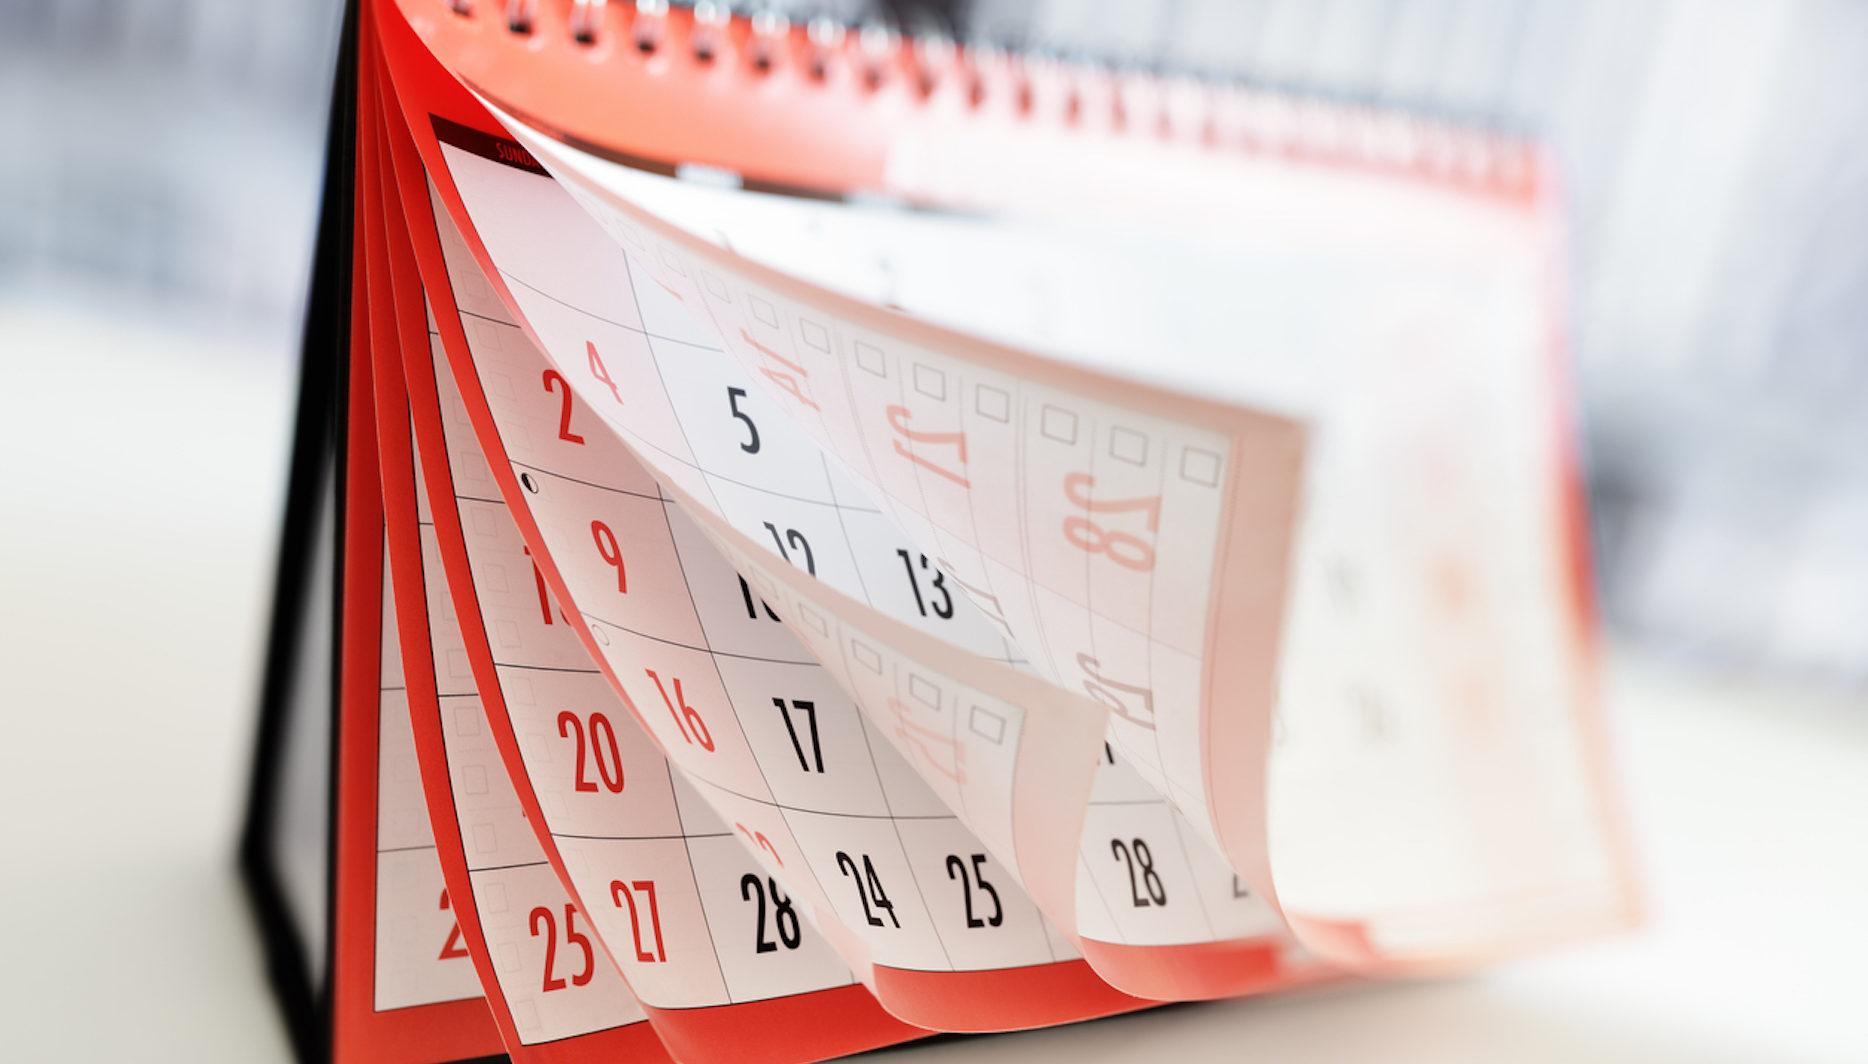 calendrier fin d'année image.jpg